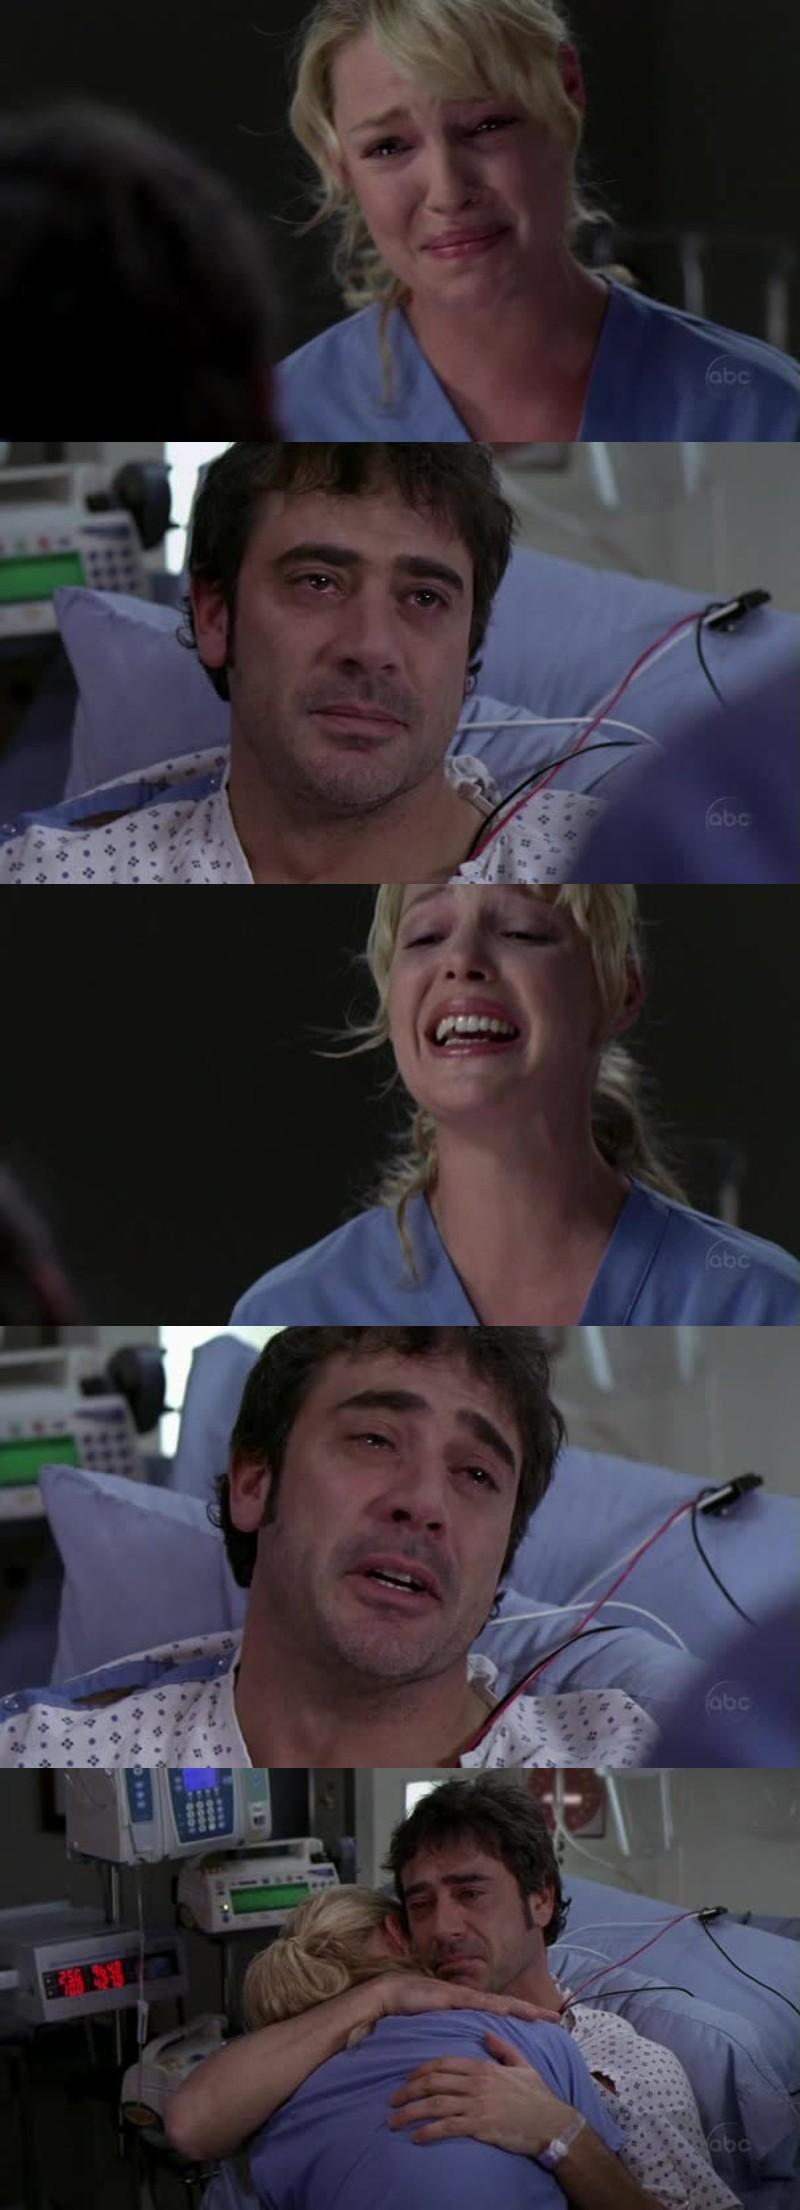 I'm just crying so hard